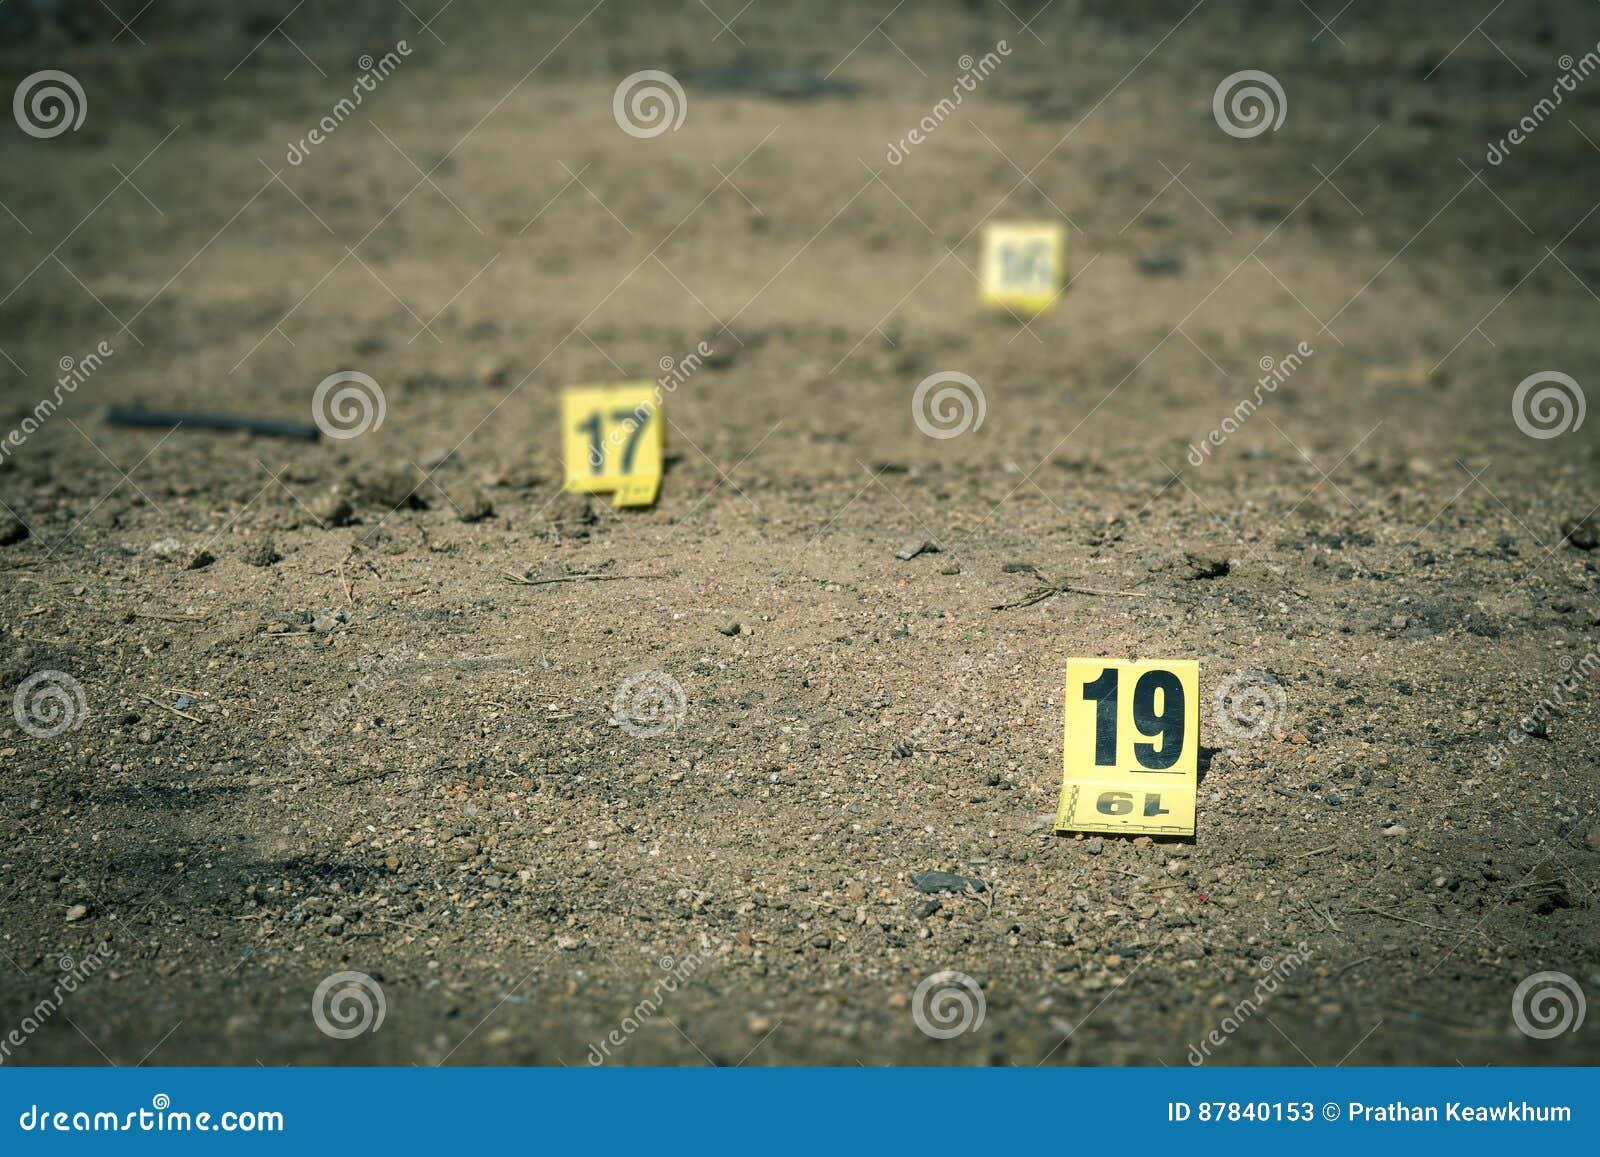 Group of evidence marker in crime scene investigation